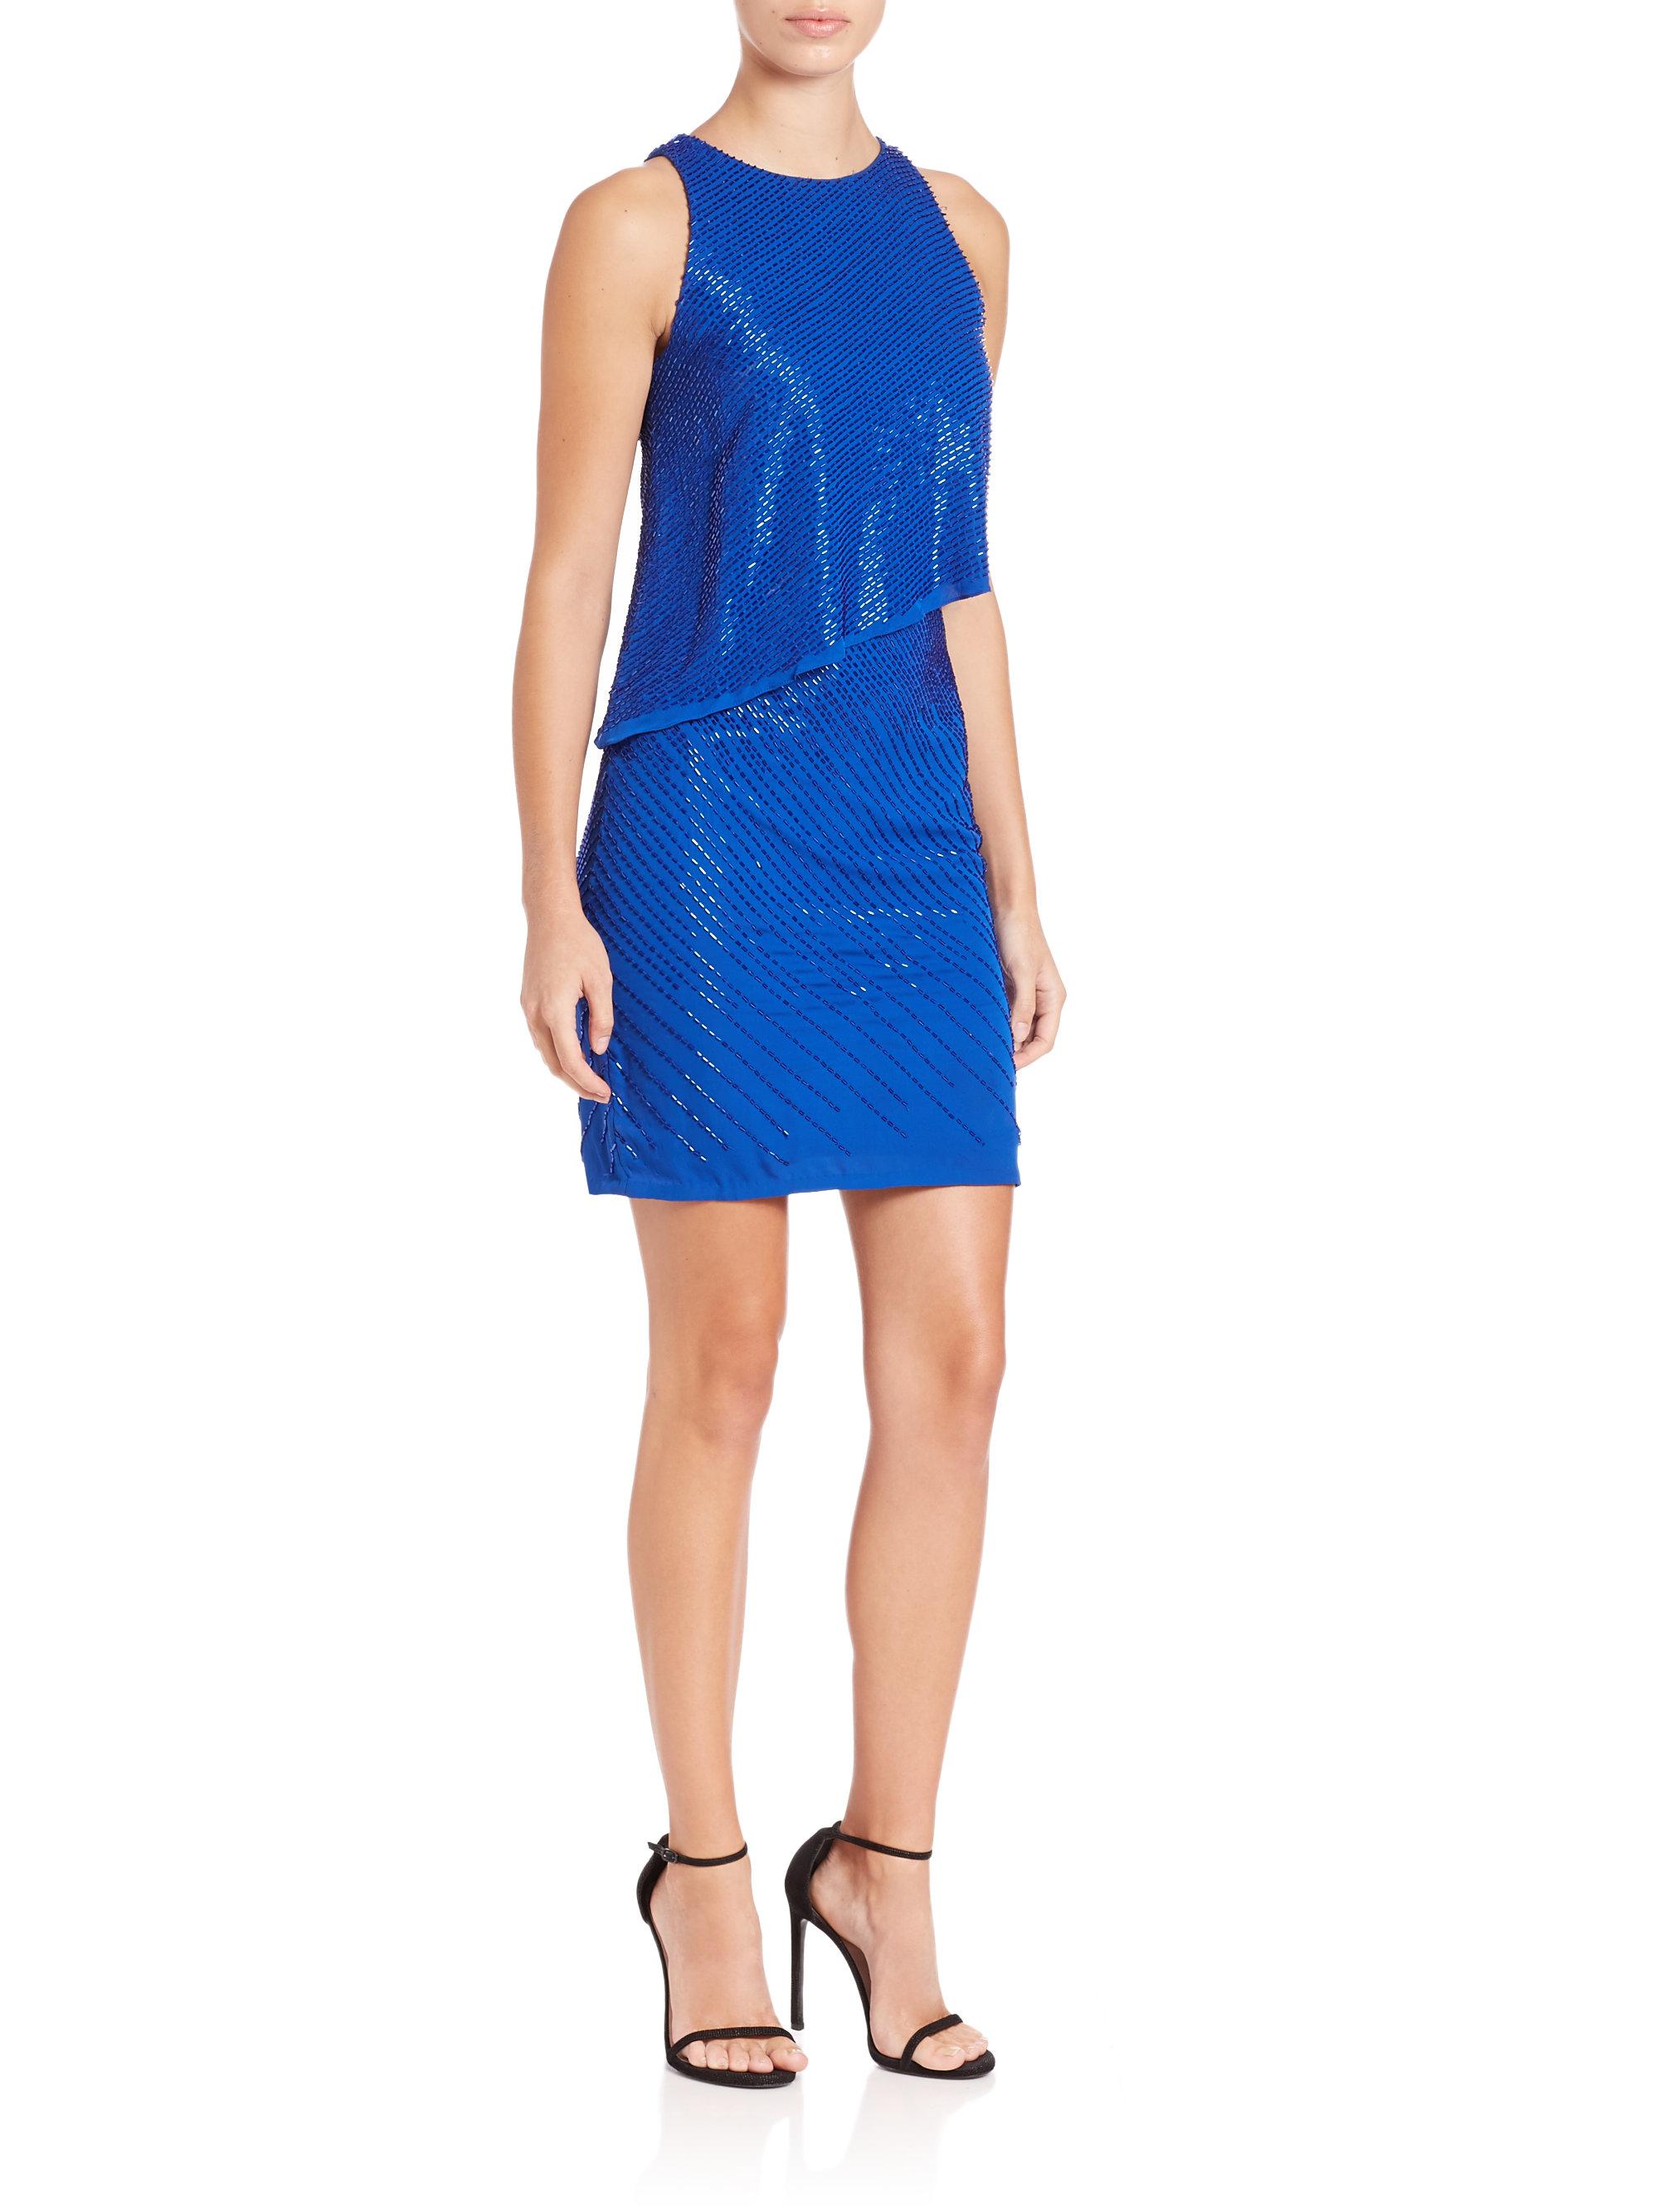 aidan mattox beaded cocktail dress in blue lyst